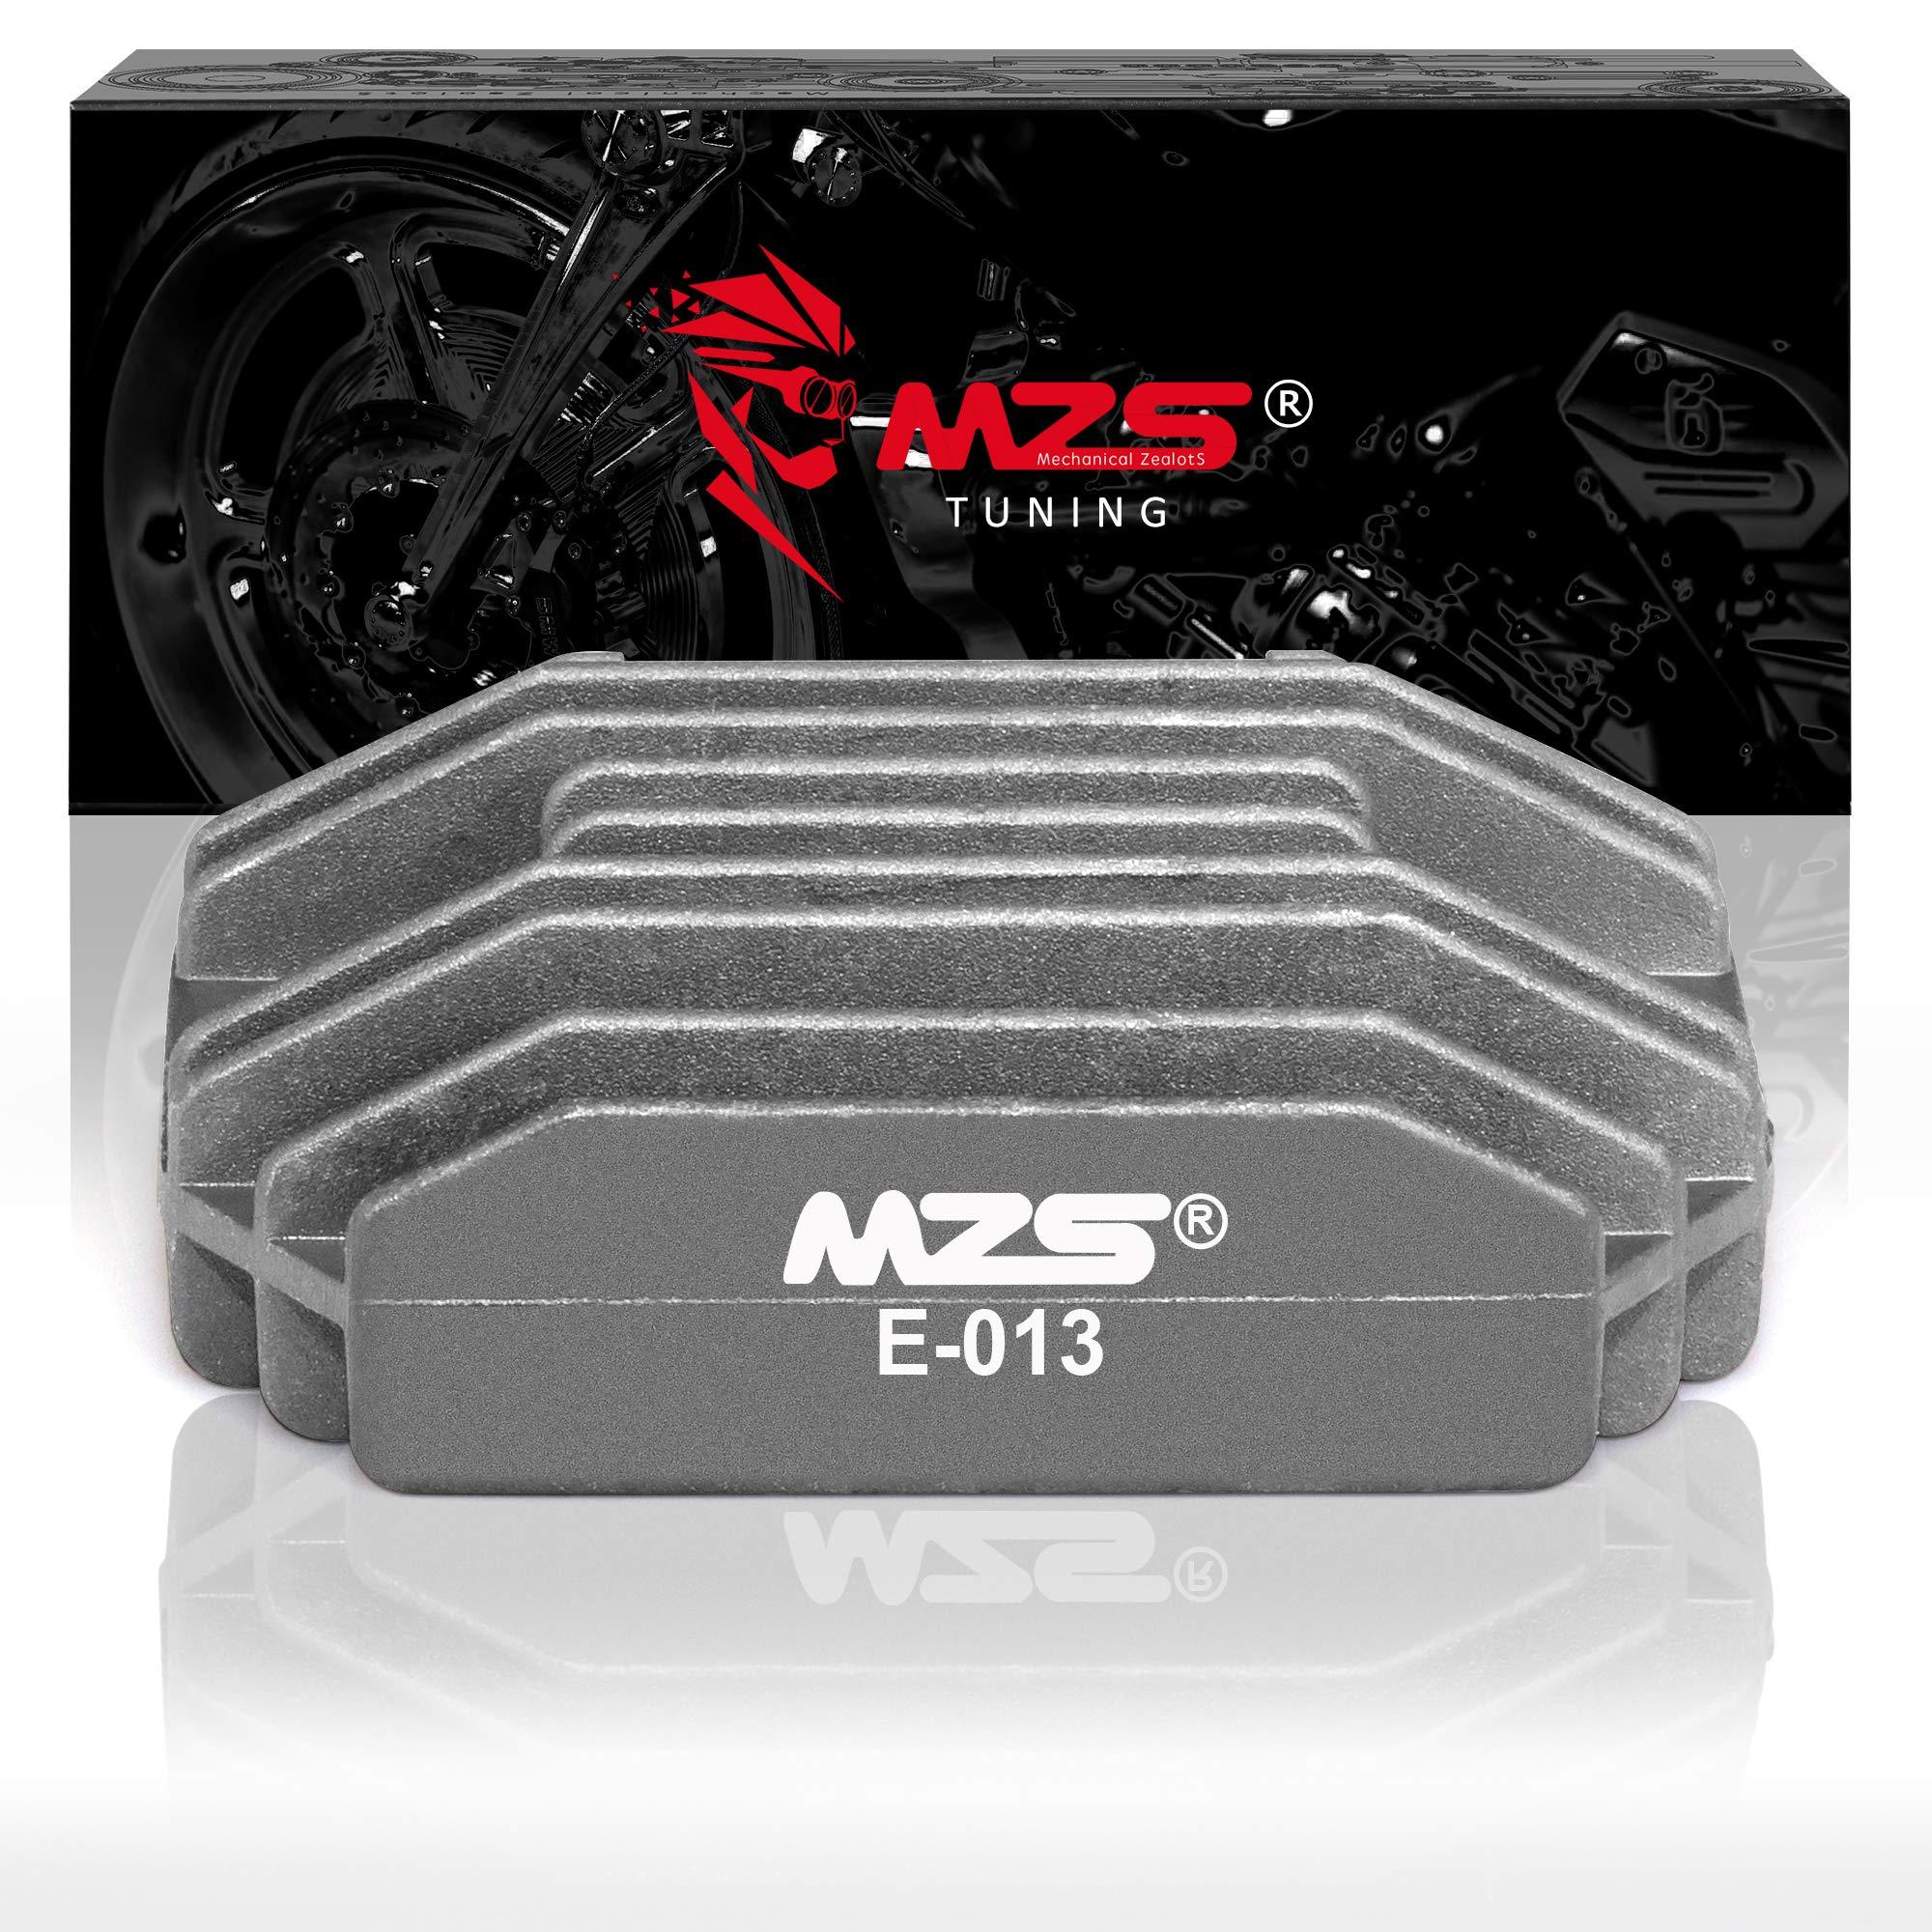 MZS Voltage Regulator Rectifier for Yamaha R1 98-01/ R6 99-05/ R6S/ YZF600/ FZ6/ FZ6N/ FZ6S/ FZ6R/ FZR600/ V-STAR XVS400/ XP500 T-MAX 500/ TDM 800 850/ XJ600/ MAX 600 700/ SX 600 700/ VMAX 600 700